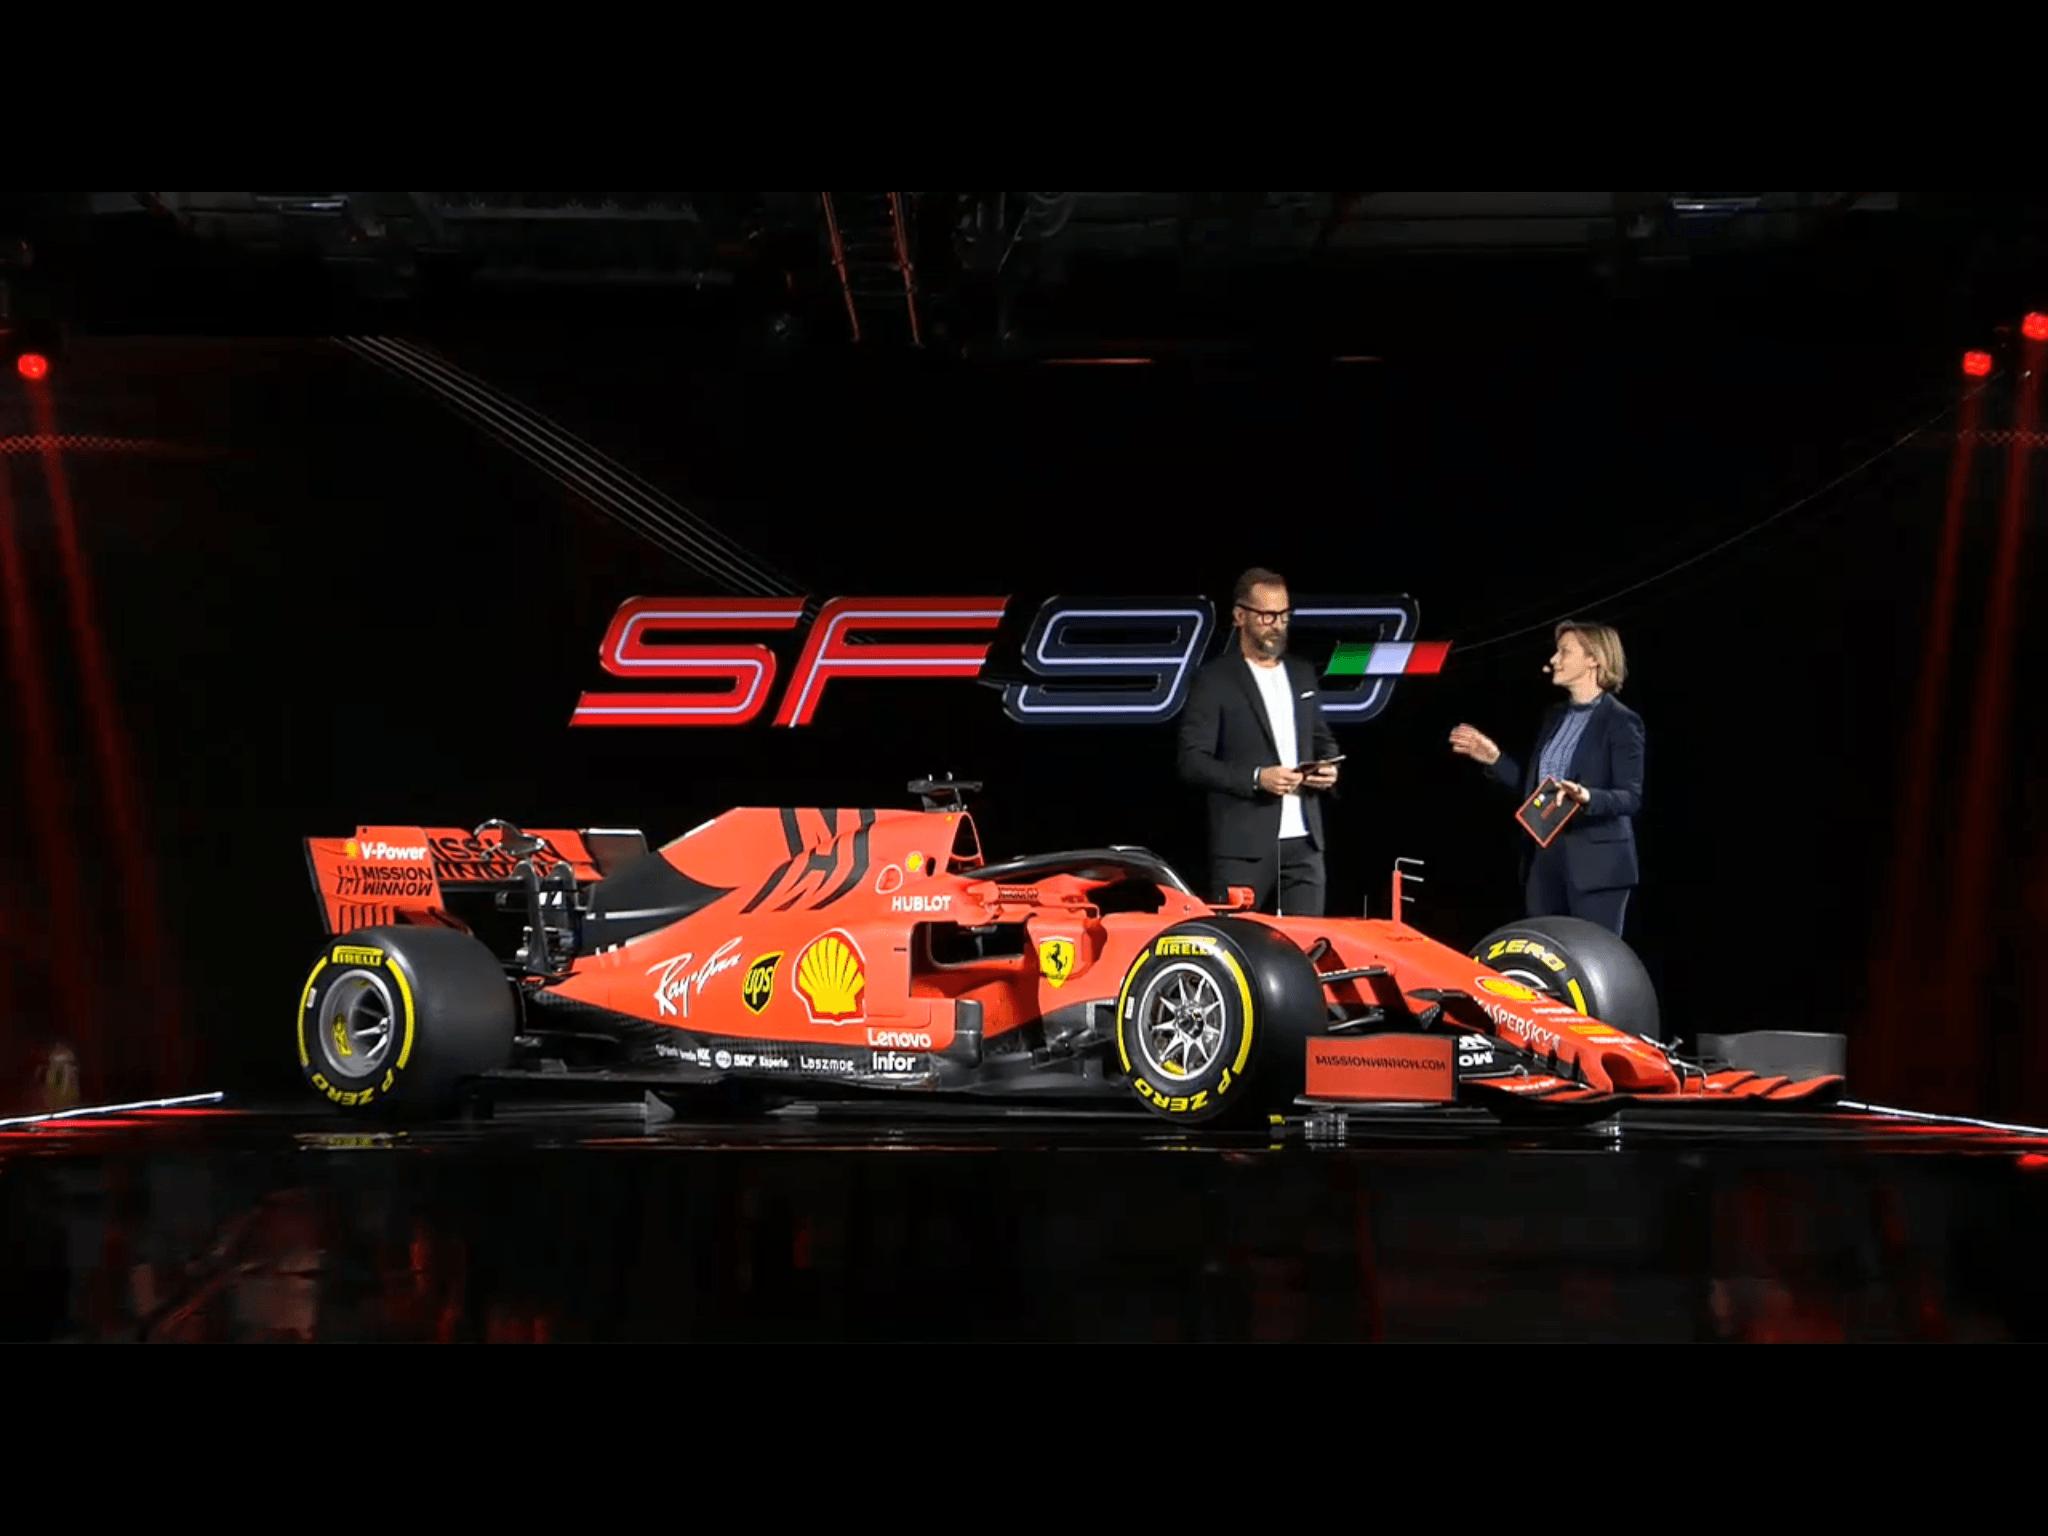 2019 Ferrari Sf90 F1 Car Launch Pictures F1 Fansitecom